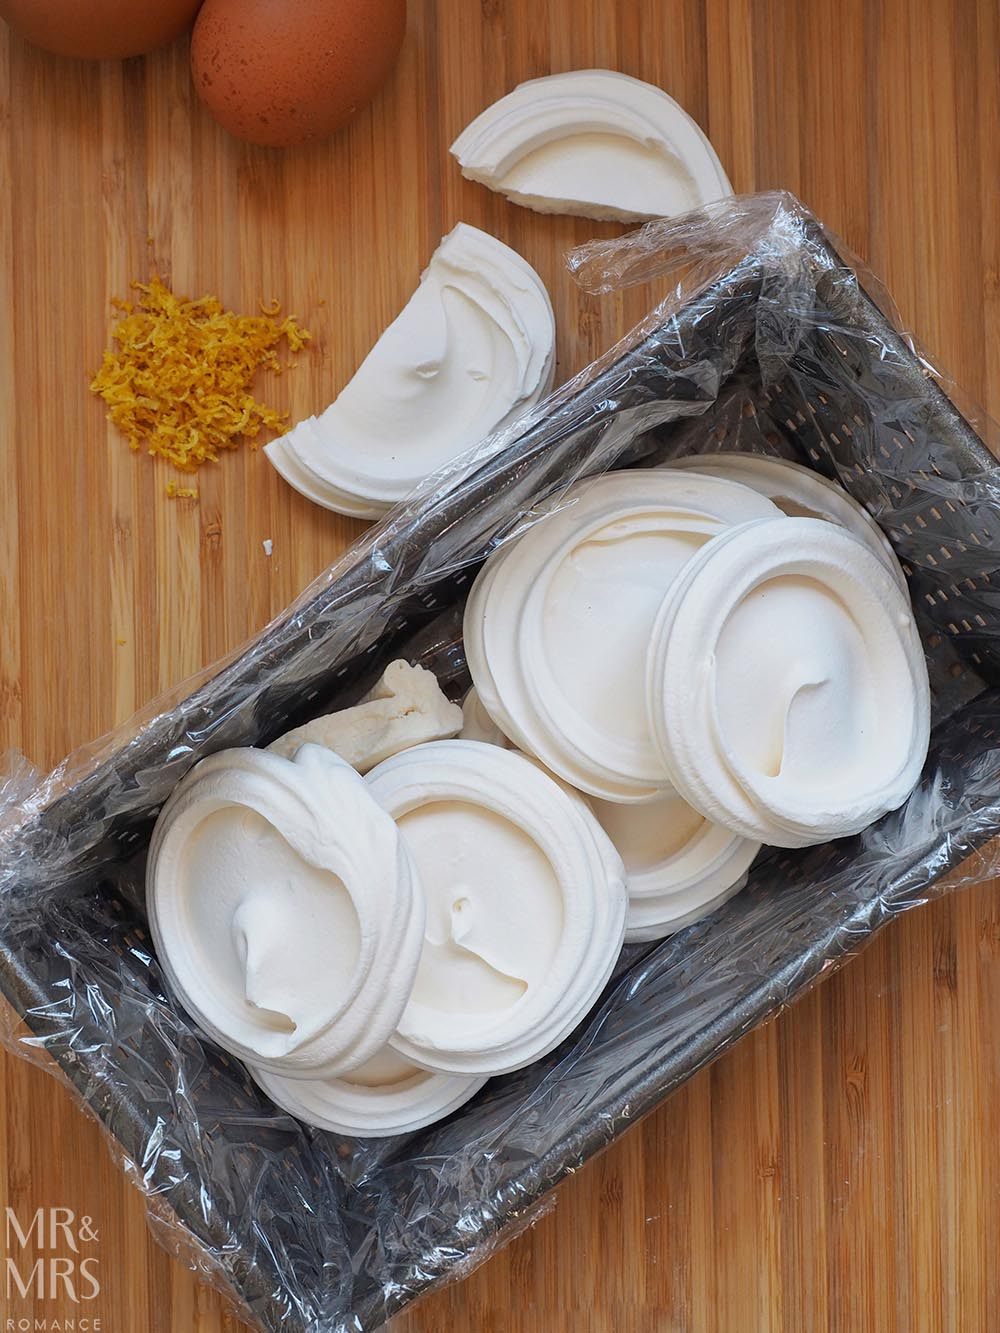 Lemon Meringue Semifreddo Recipe - meringues